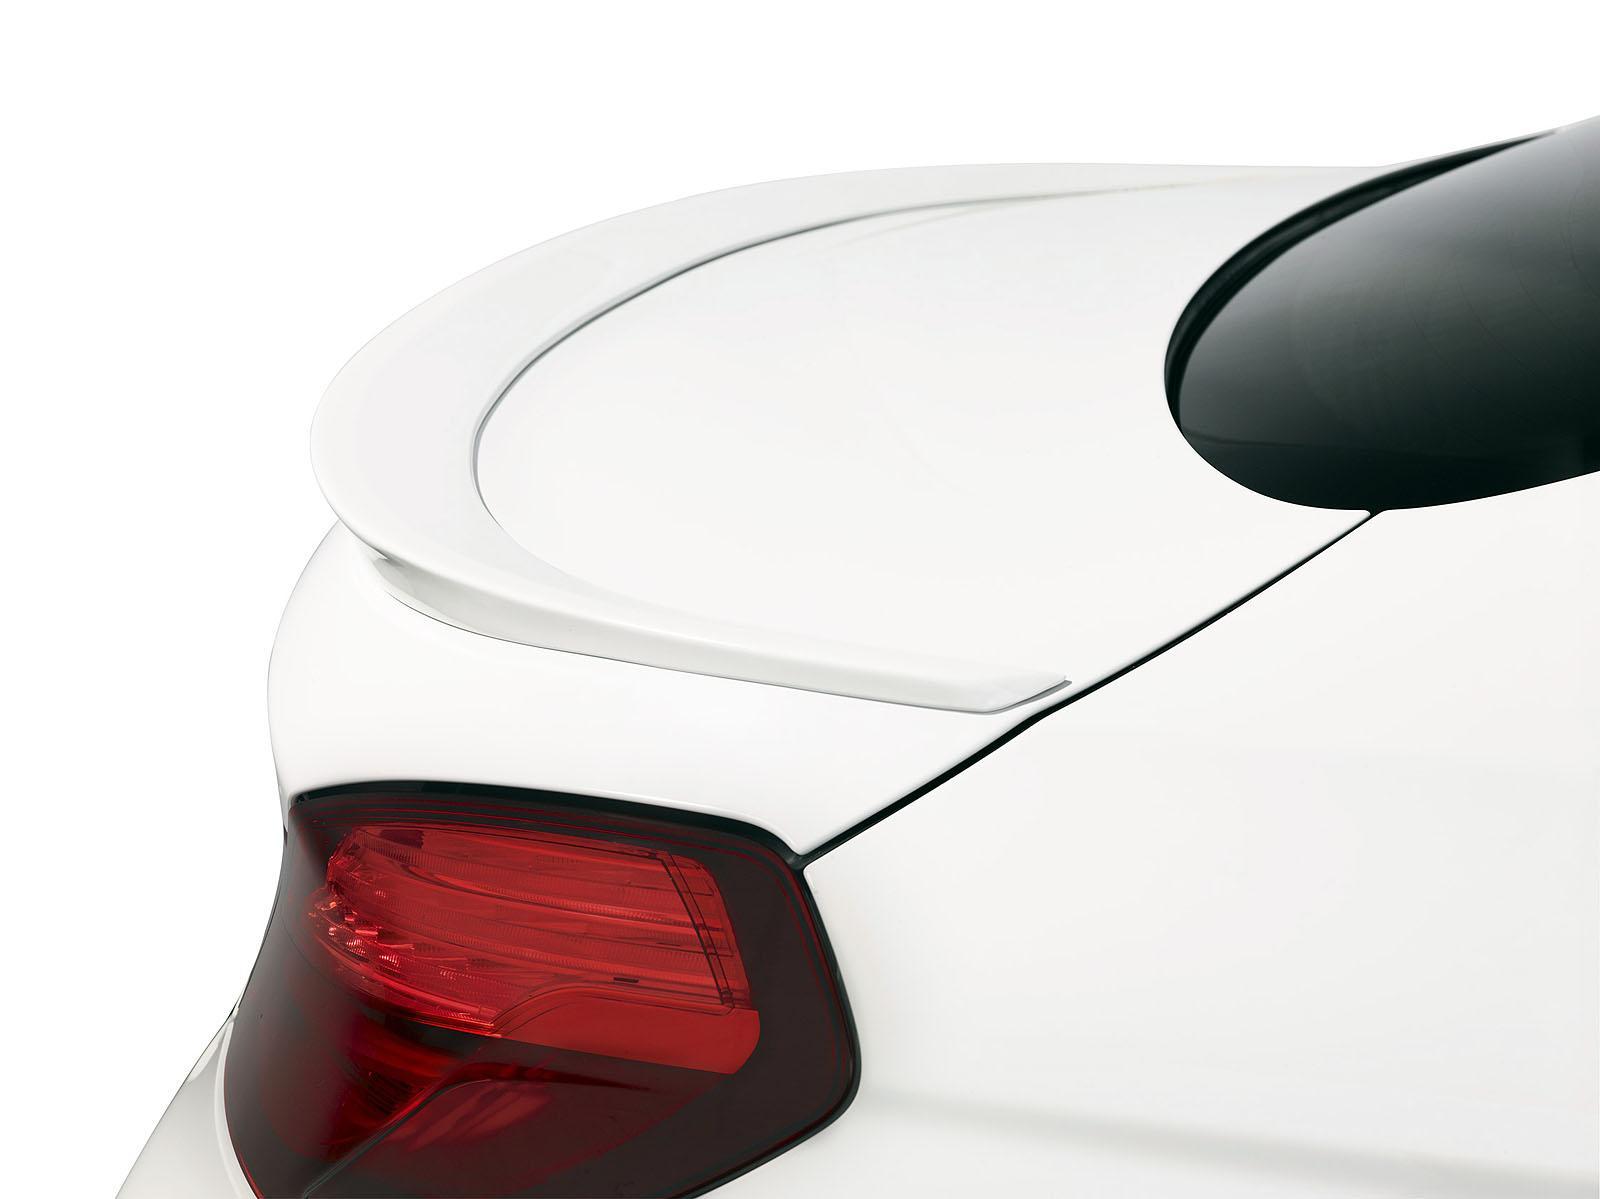 AC Schnitzer BMW 6-Series Coupe F12 [видео] - фотография №10